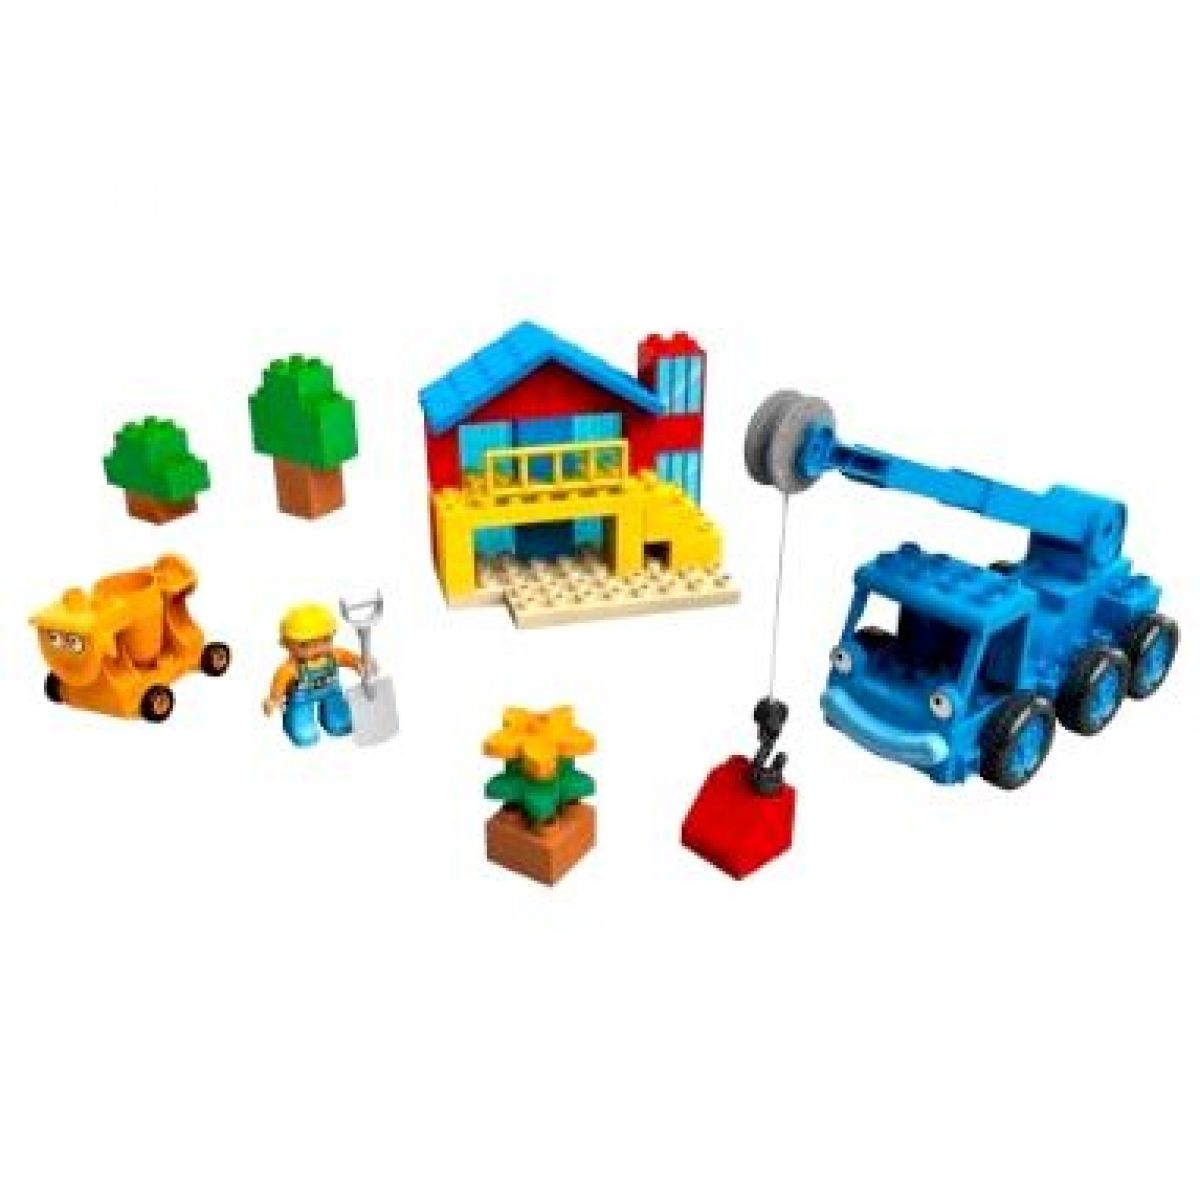 LEGO DUPLO 3597 - Lůďa a Julča při práci